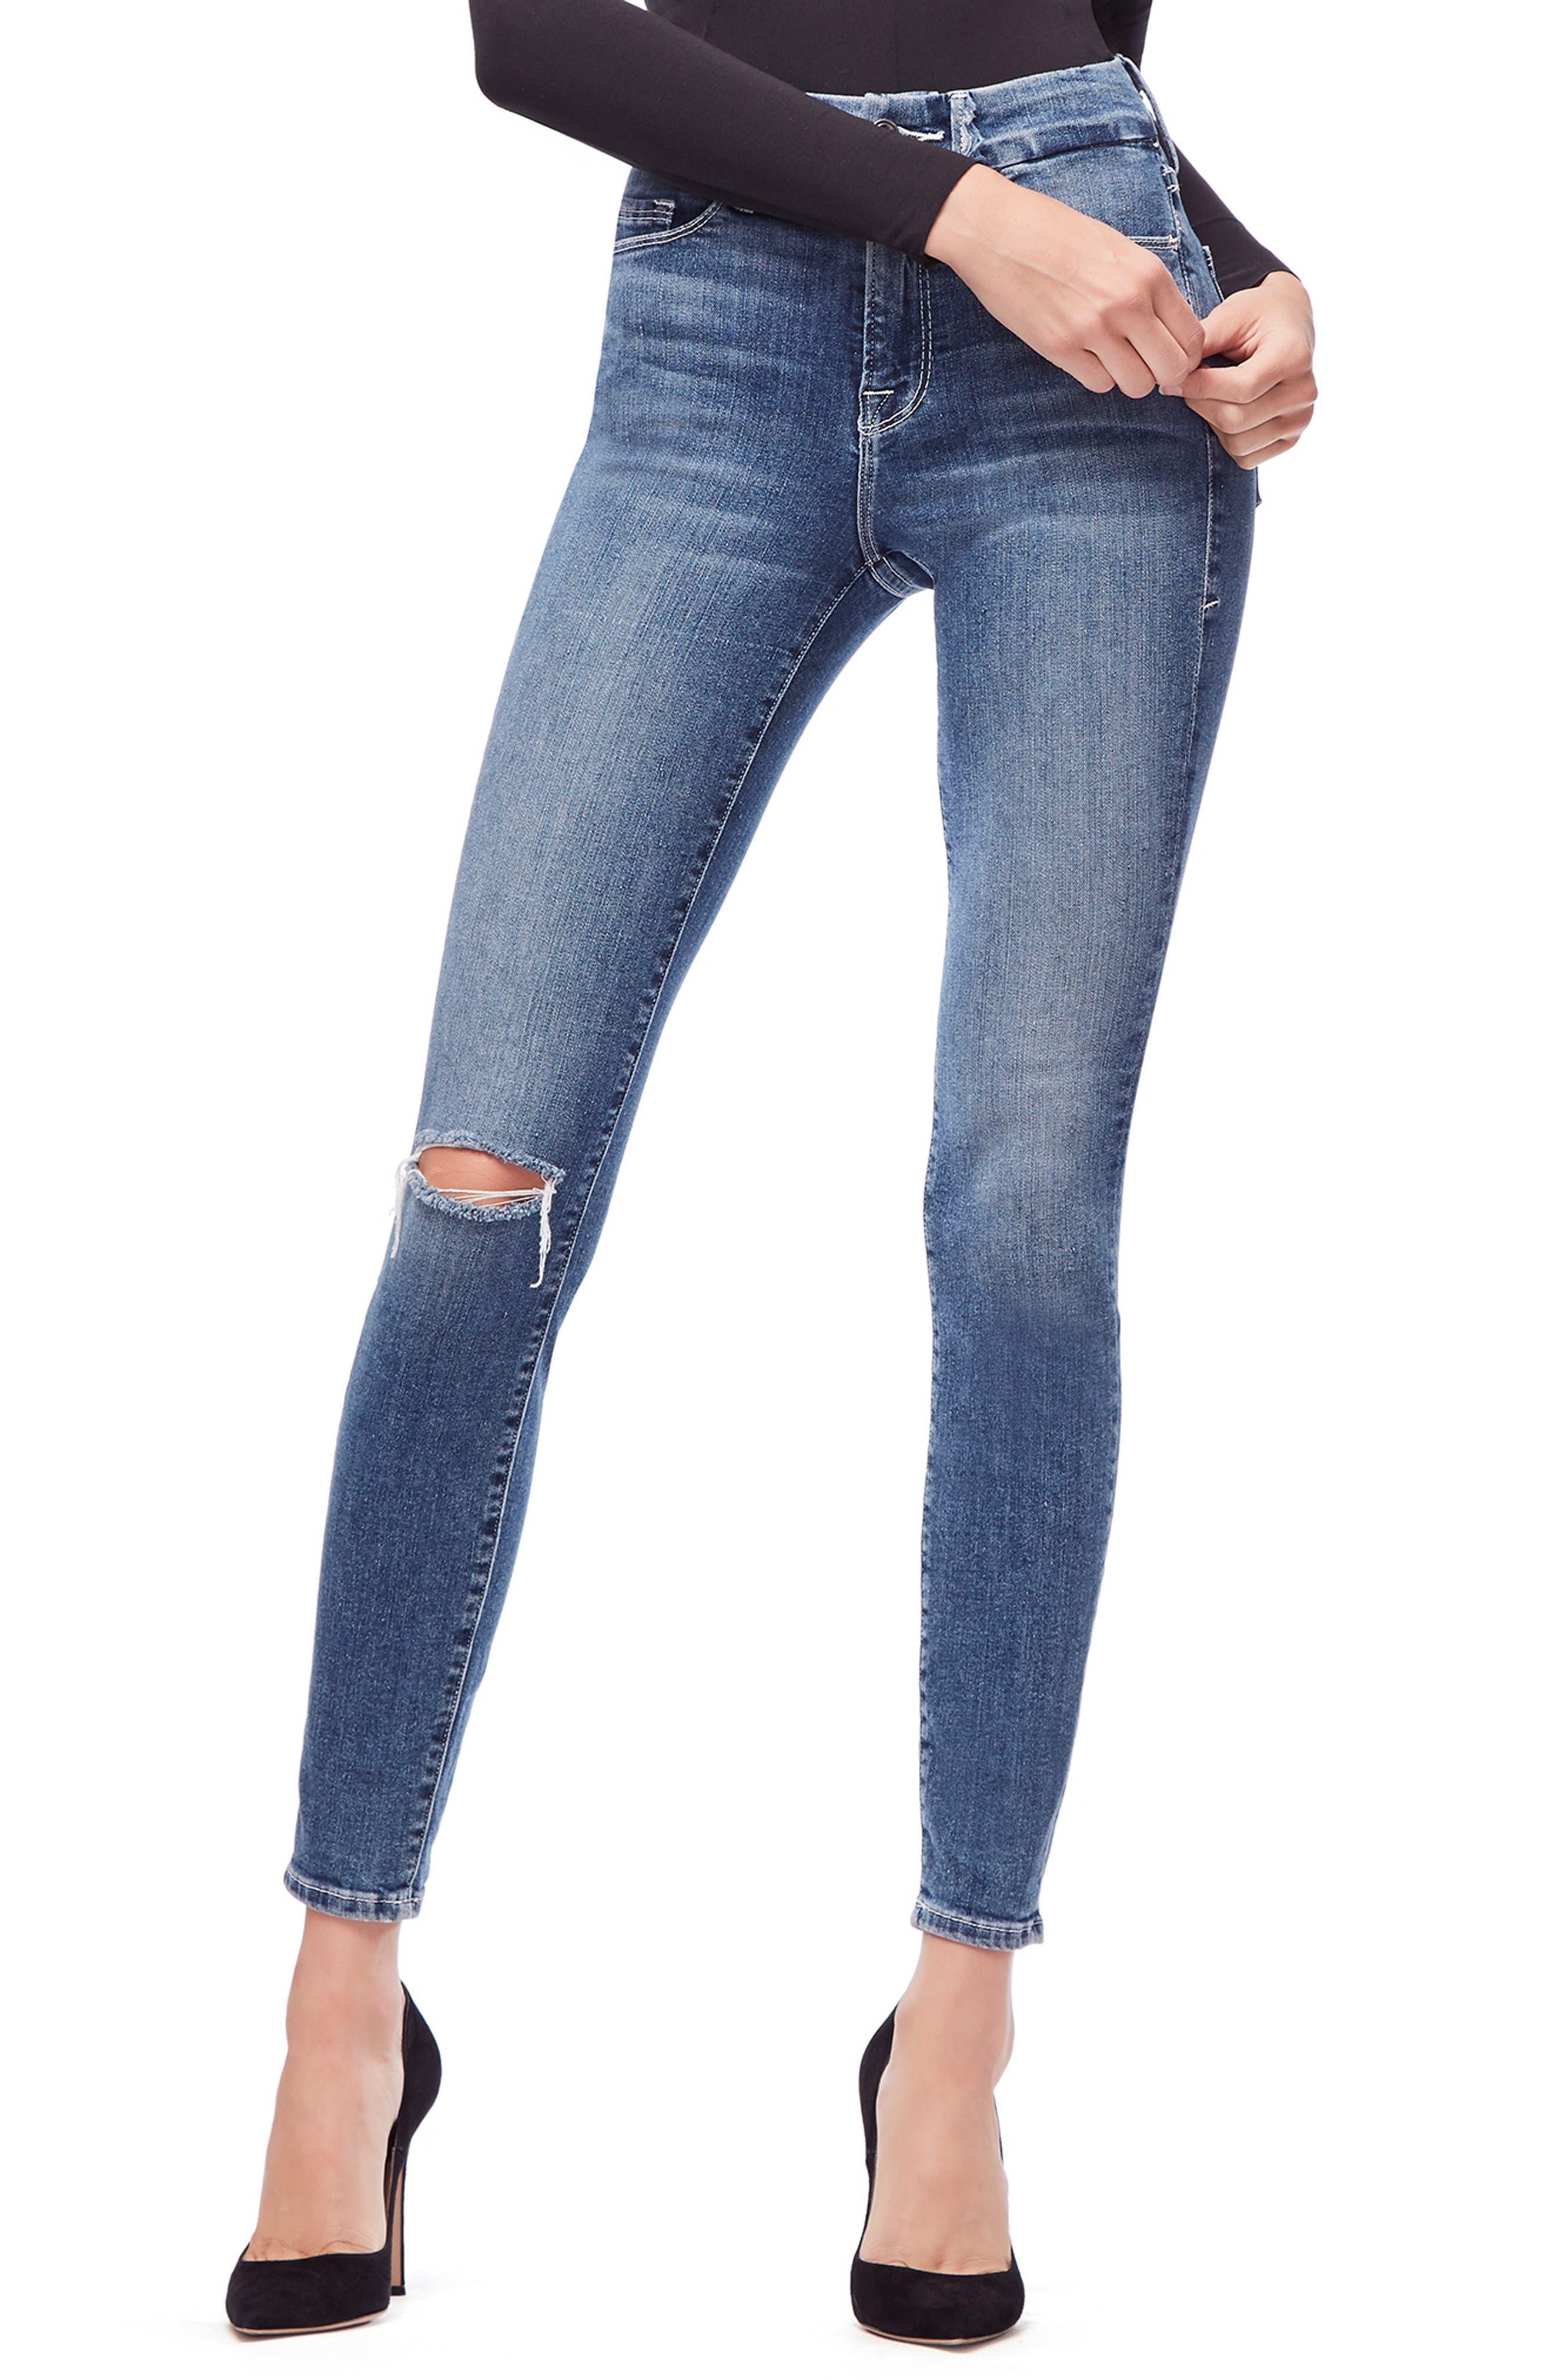 GOOD AMERICAN, Good Legs High Waist Skinny Jeans, Main thumbnail 1, color, BLUE186